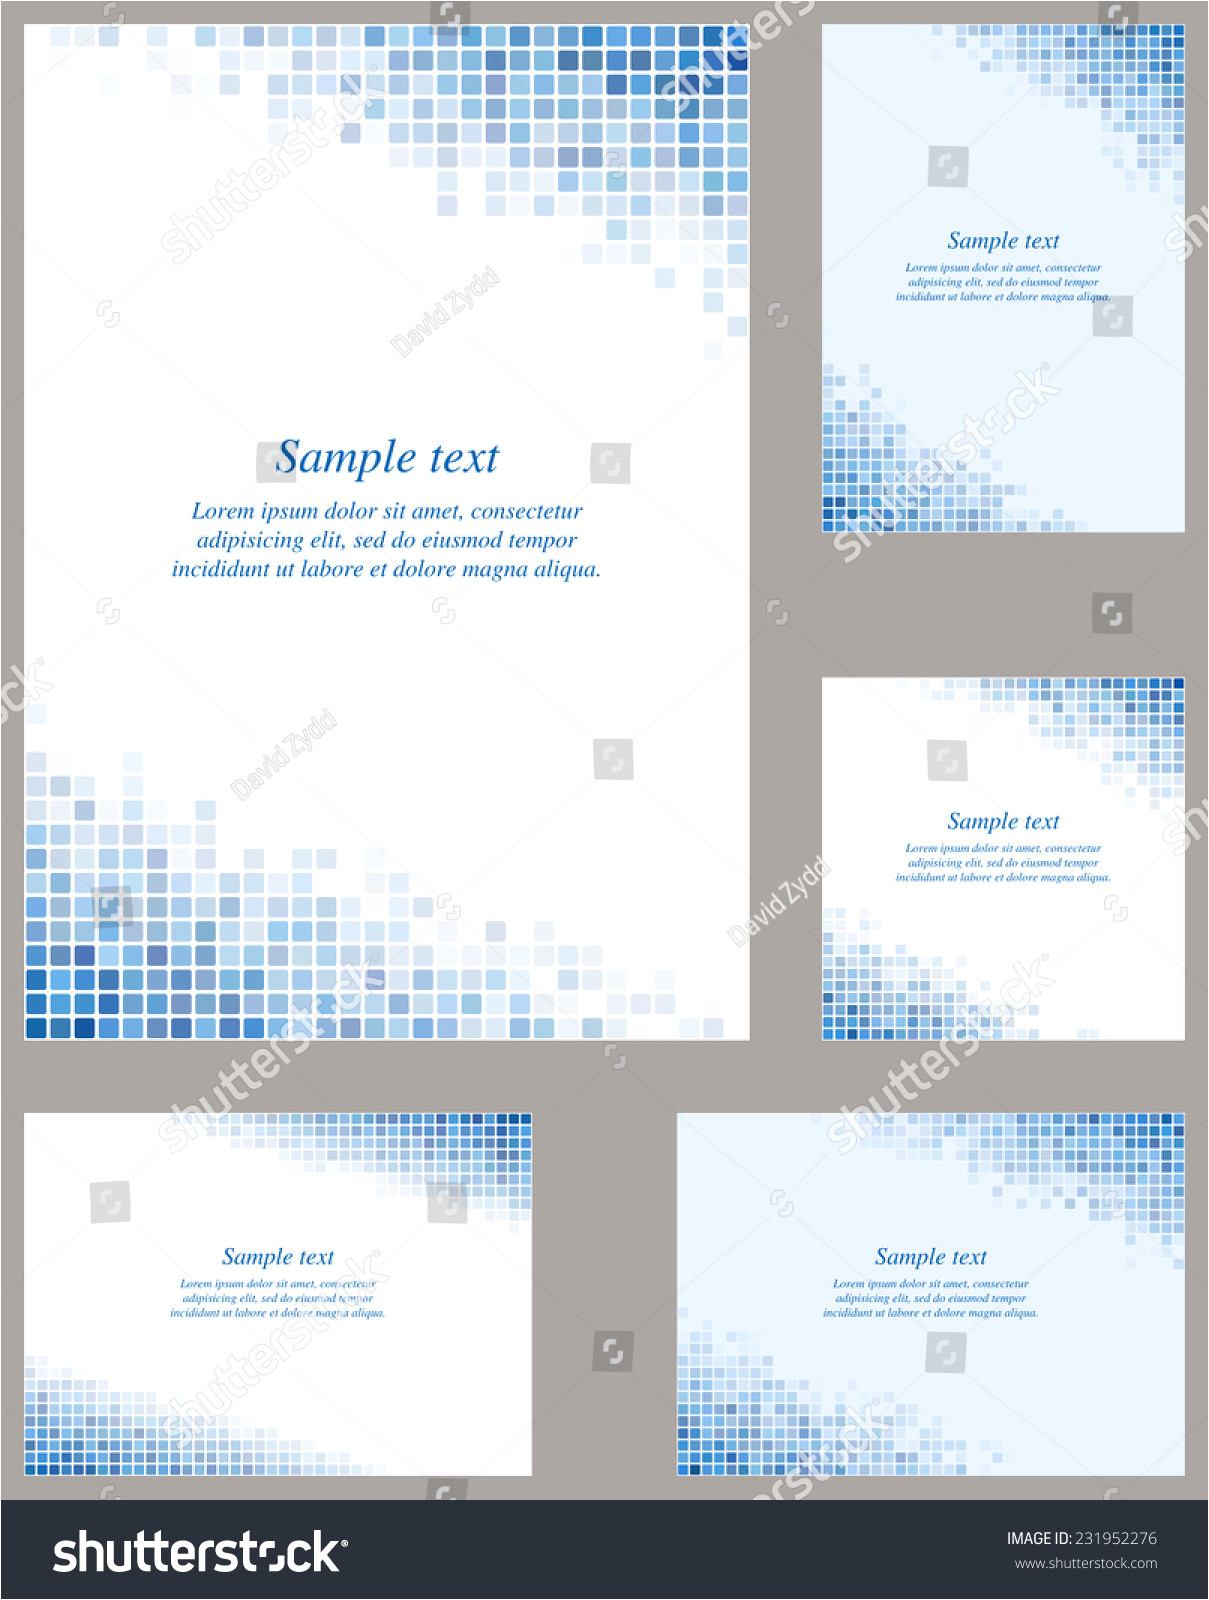 stock vector blue page corner design template invitation greeting presentation card letter paper brochure 231952276 jpg